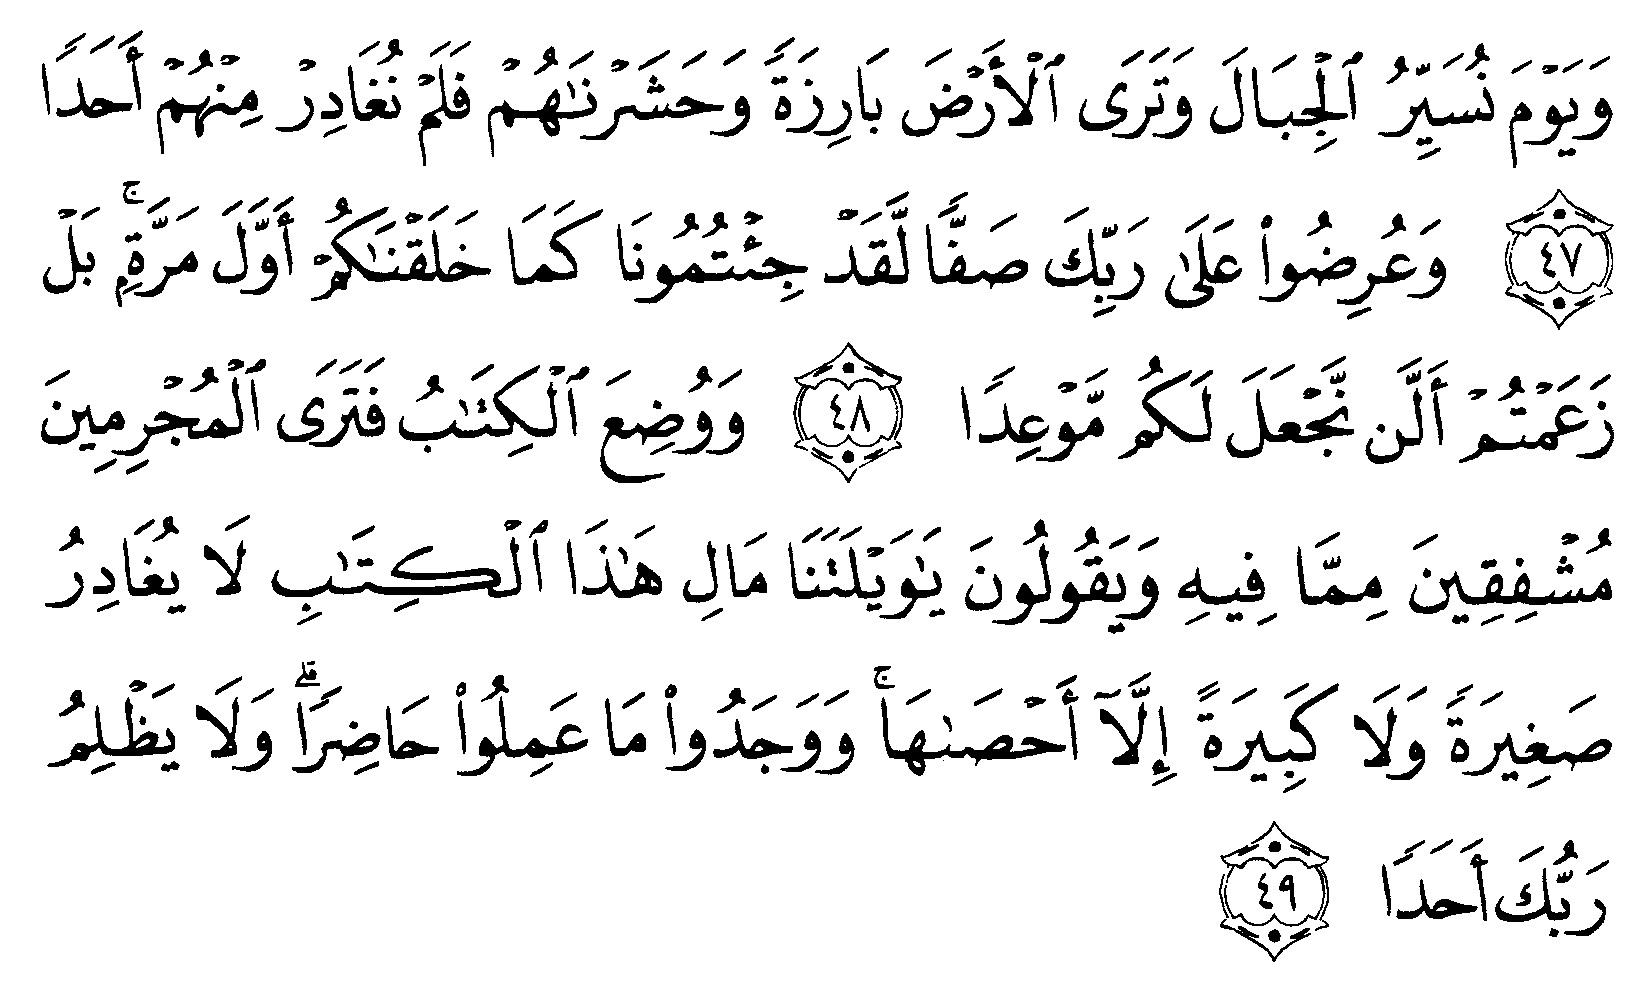 Tafsir Ibnu Katsir Surah Al Kahfi Ayat 47 49 Alquranmulia